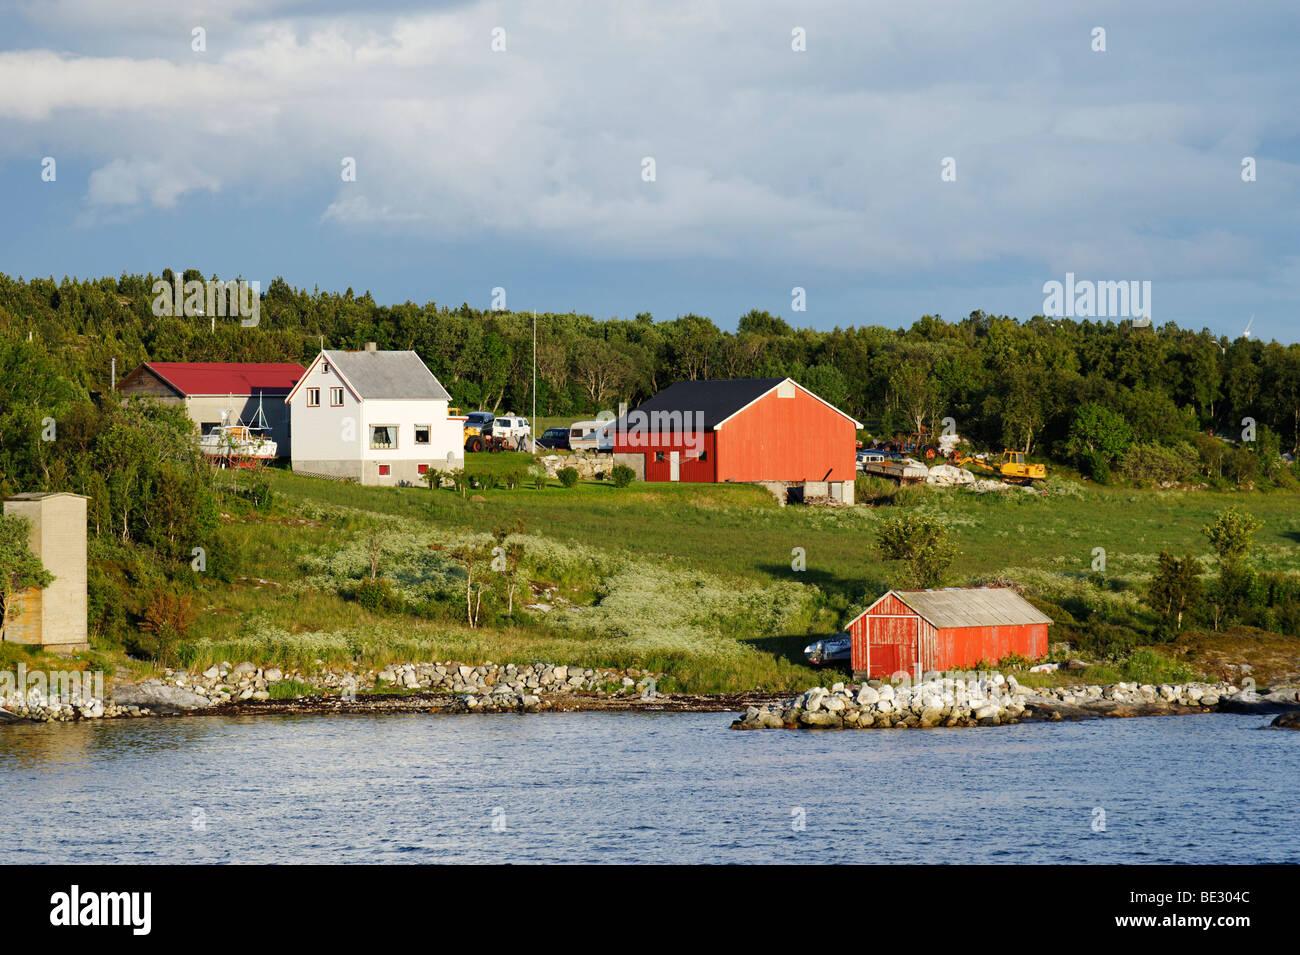 Single-family homes at the shore, Rorvik, Norway, Scandinavia, Europe - Stock Image